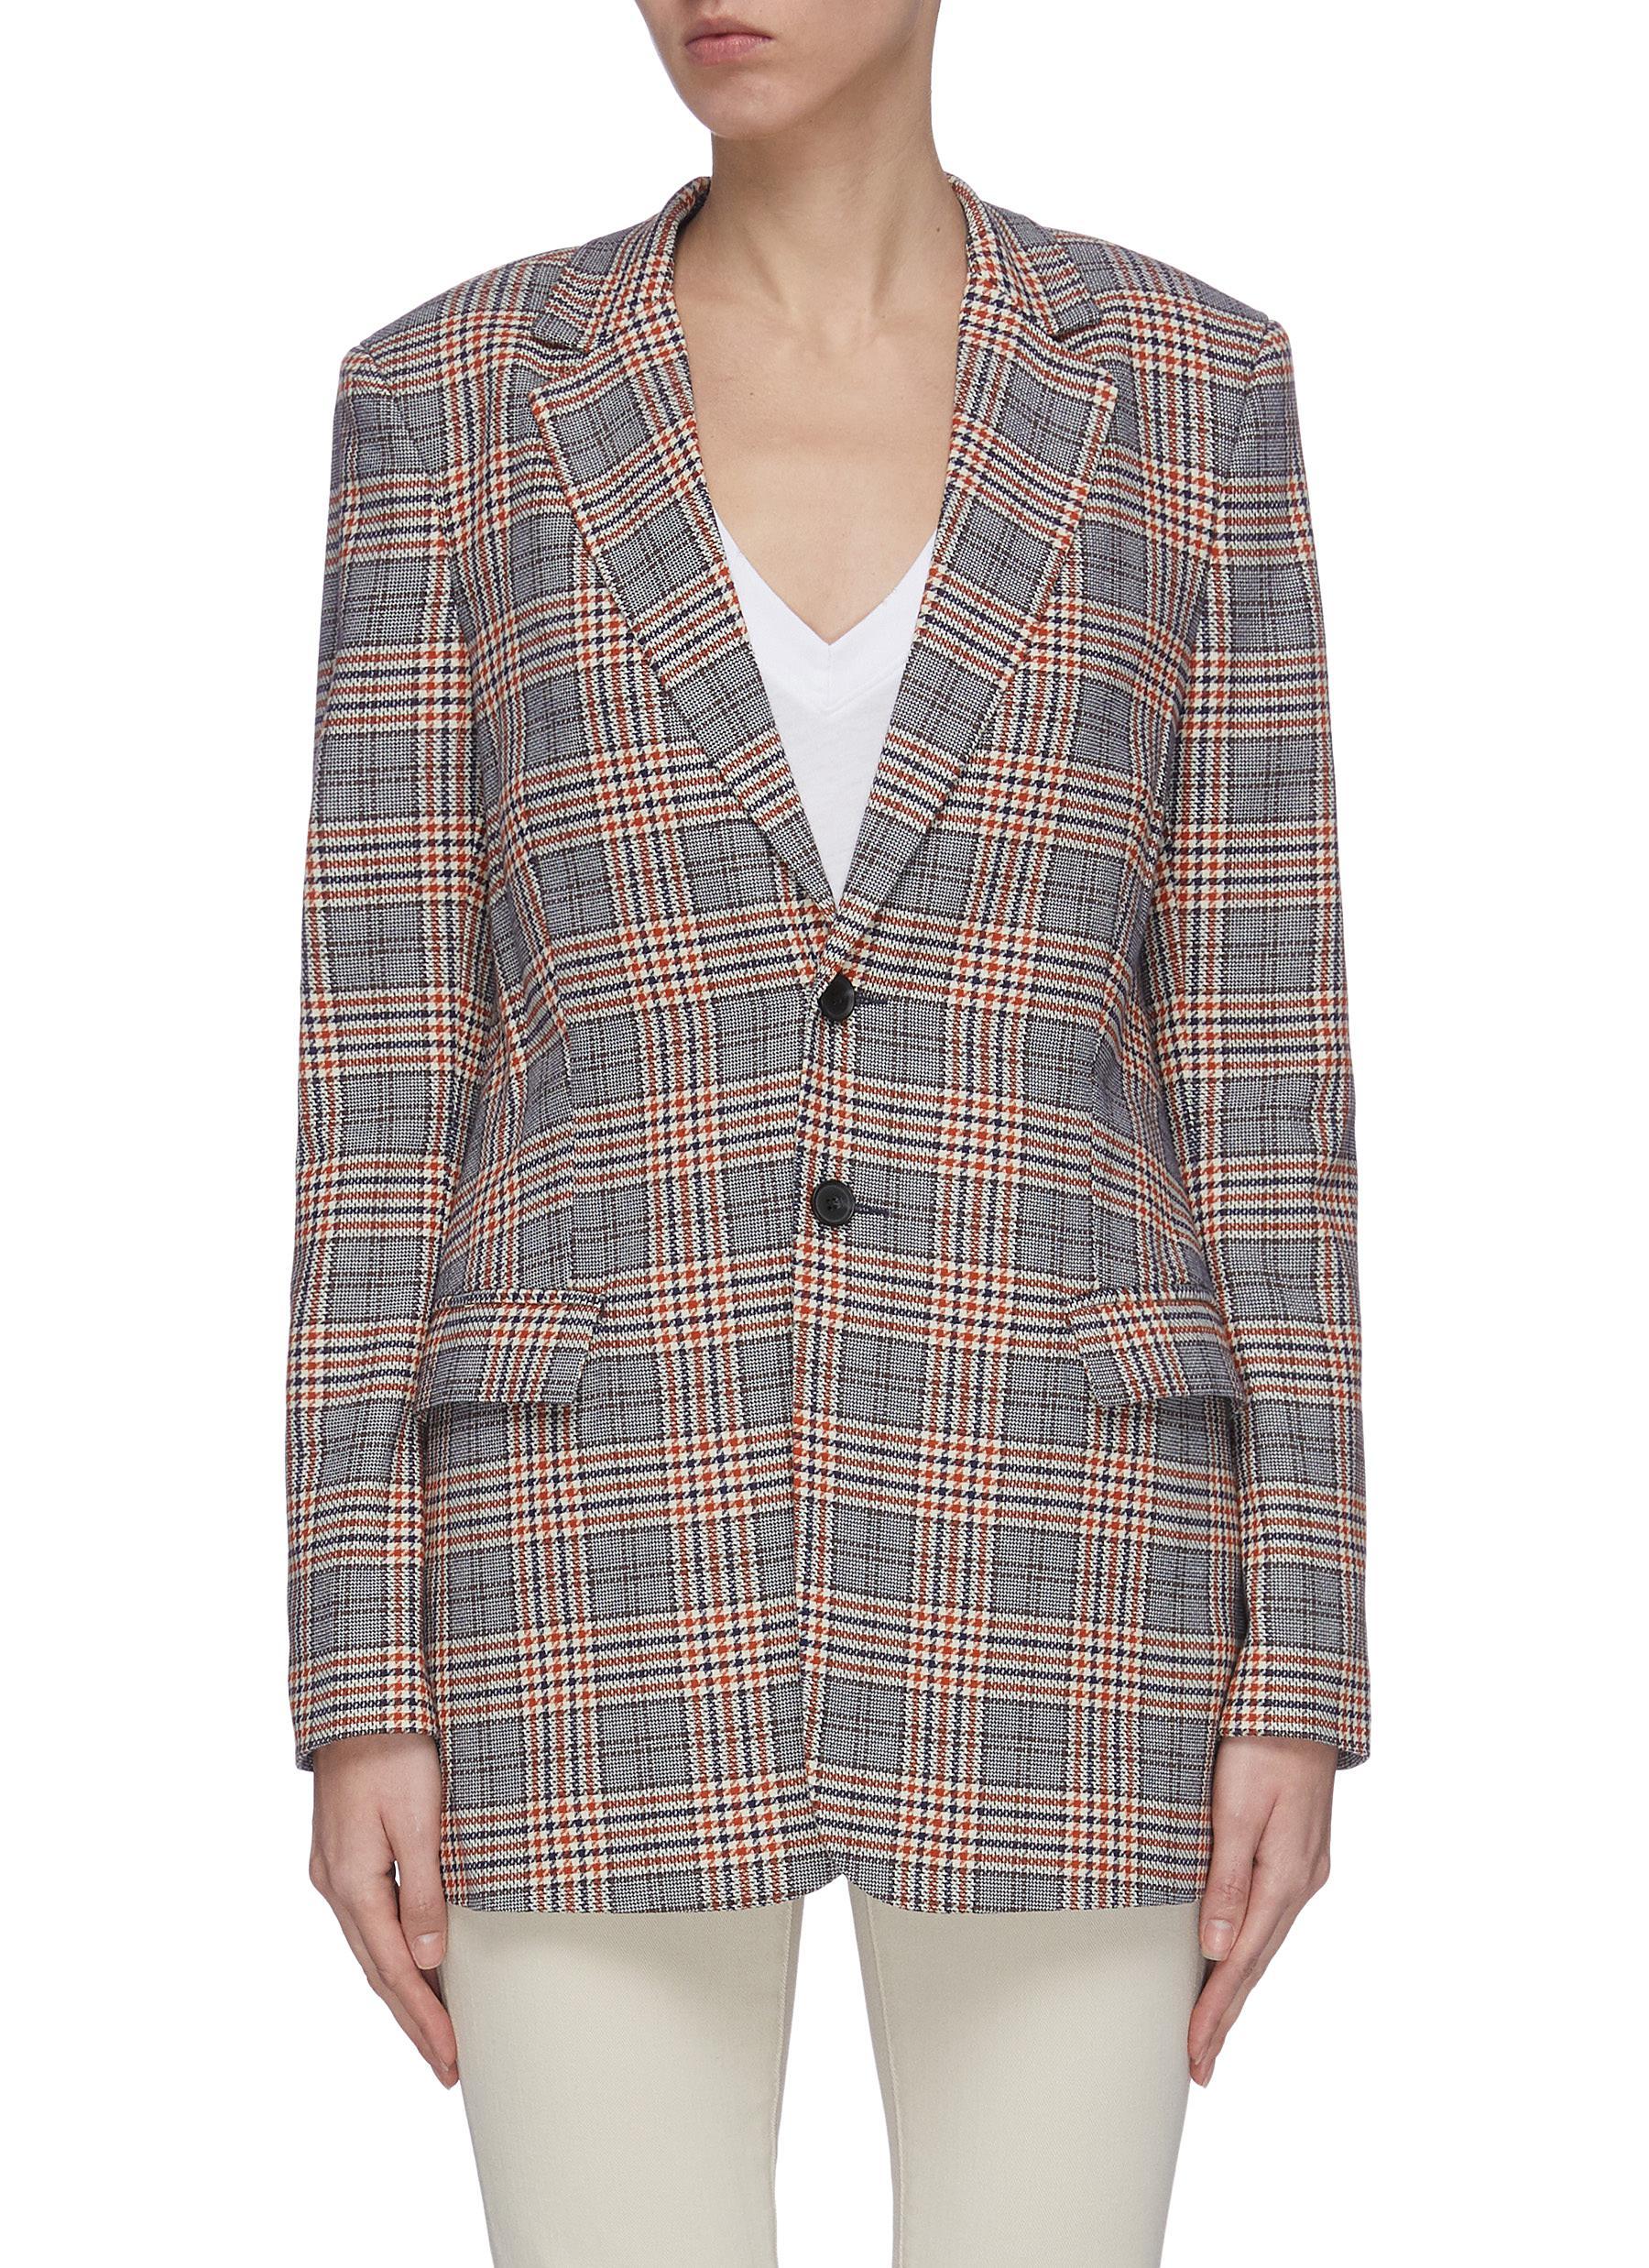 Buy Current/Elliott Blazers 'The Calla' check blazer